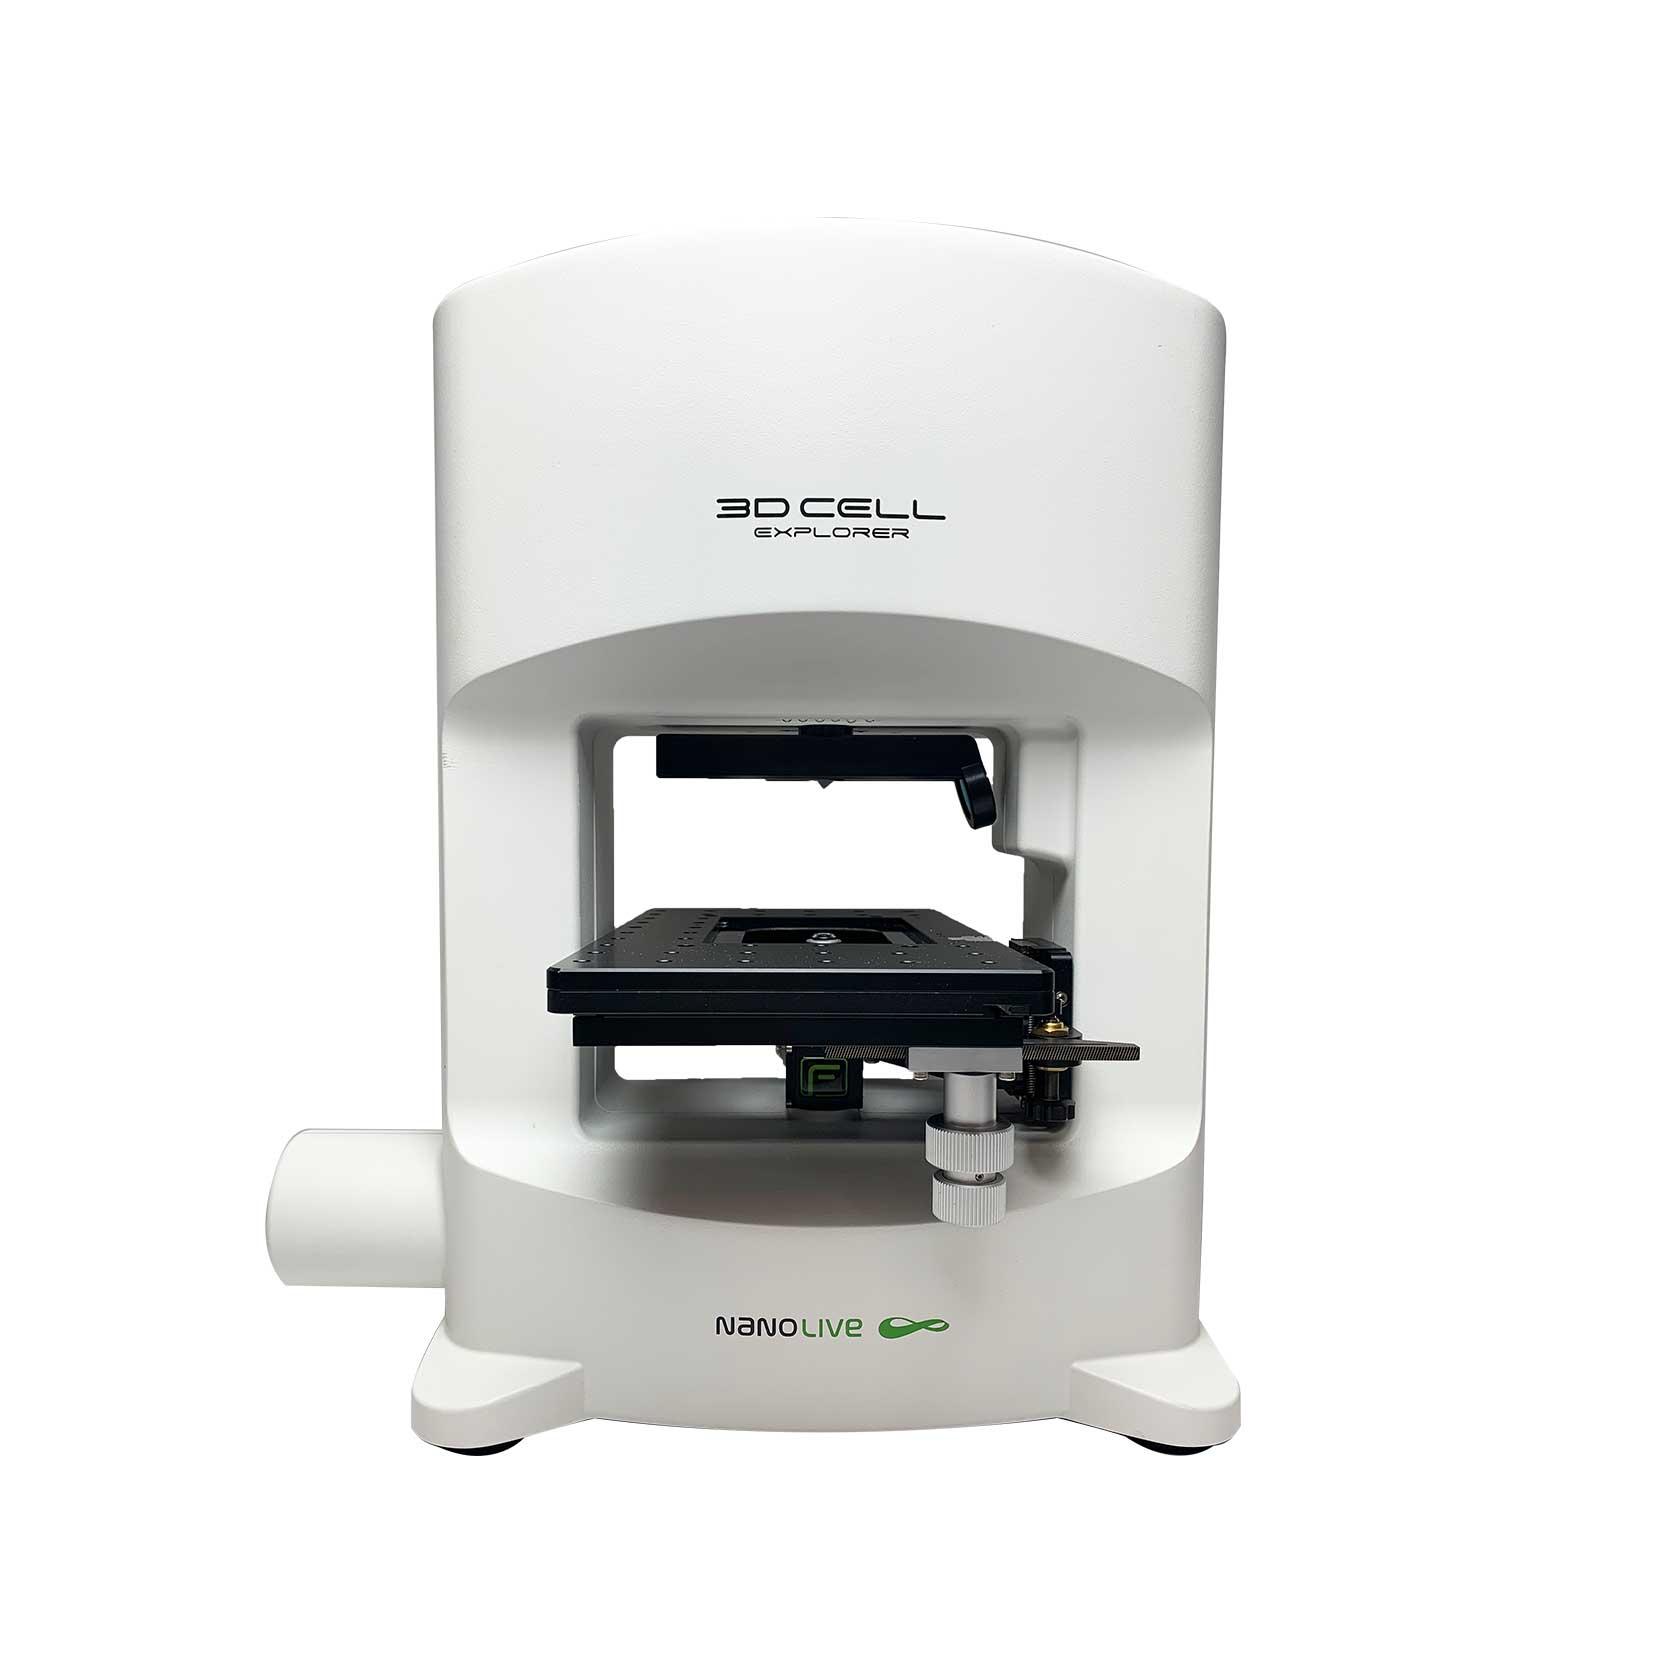 Image 3D CELL EXPLORER-fluo